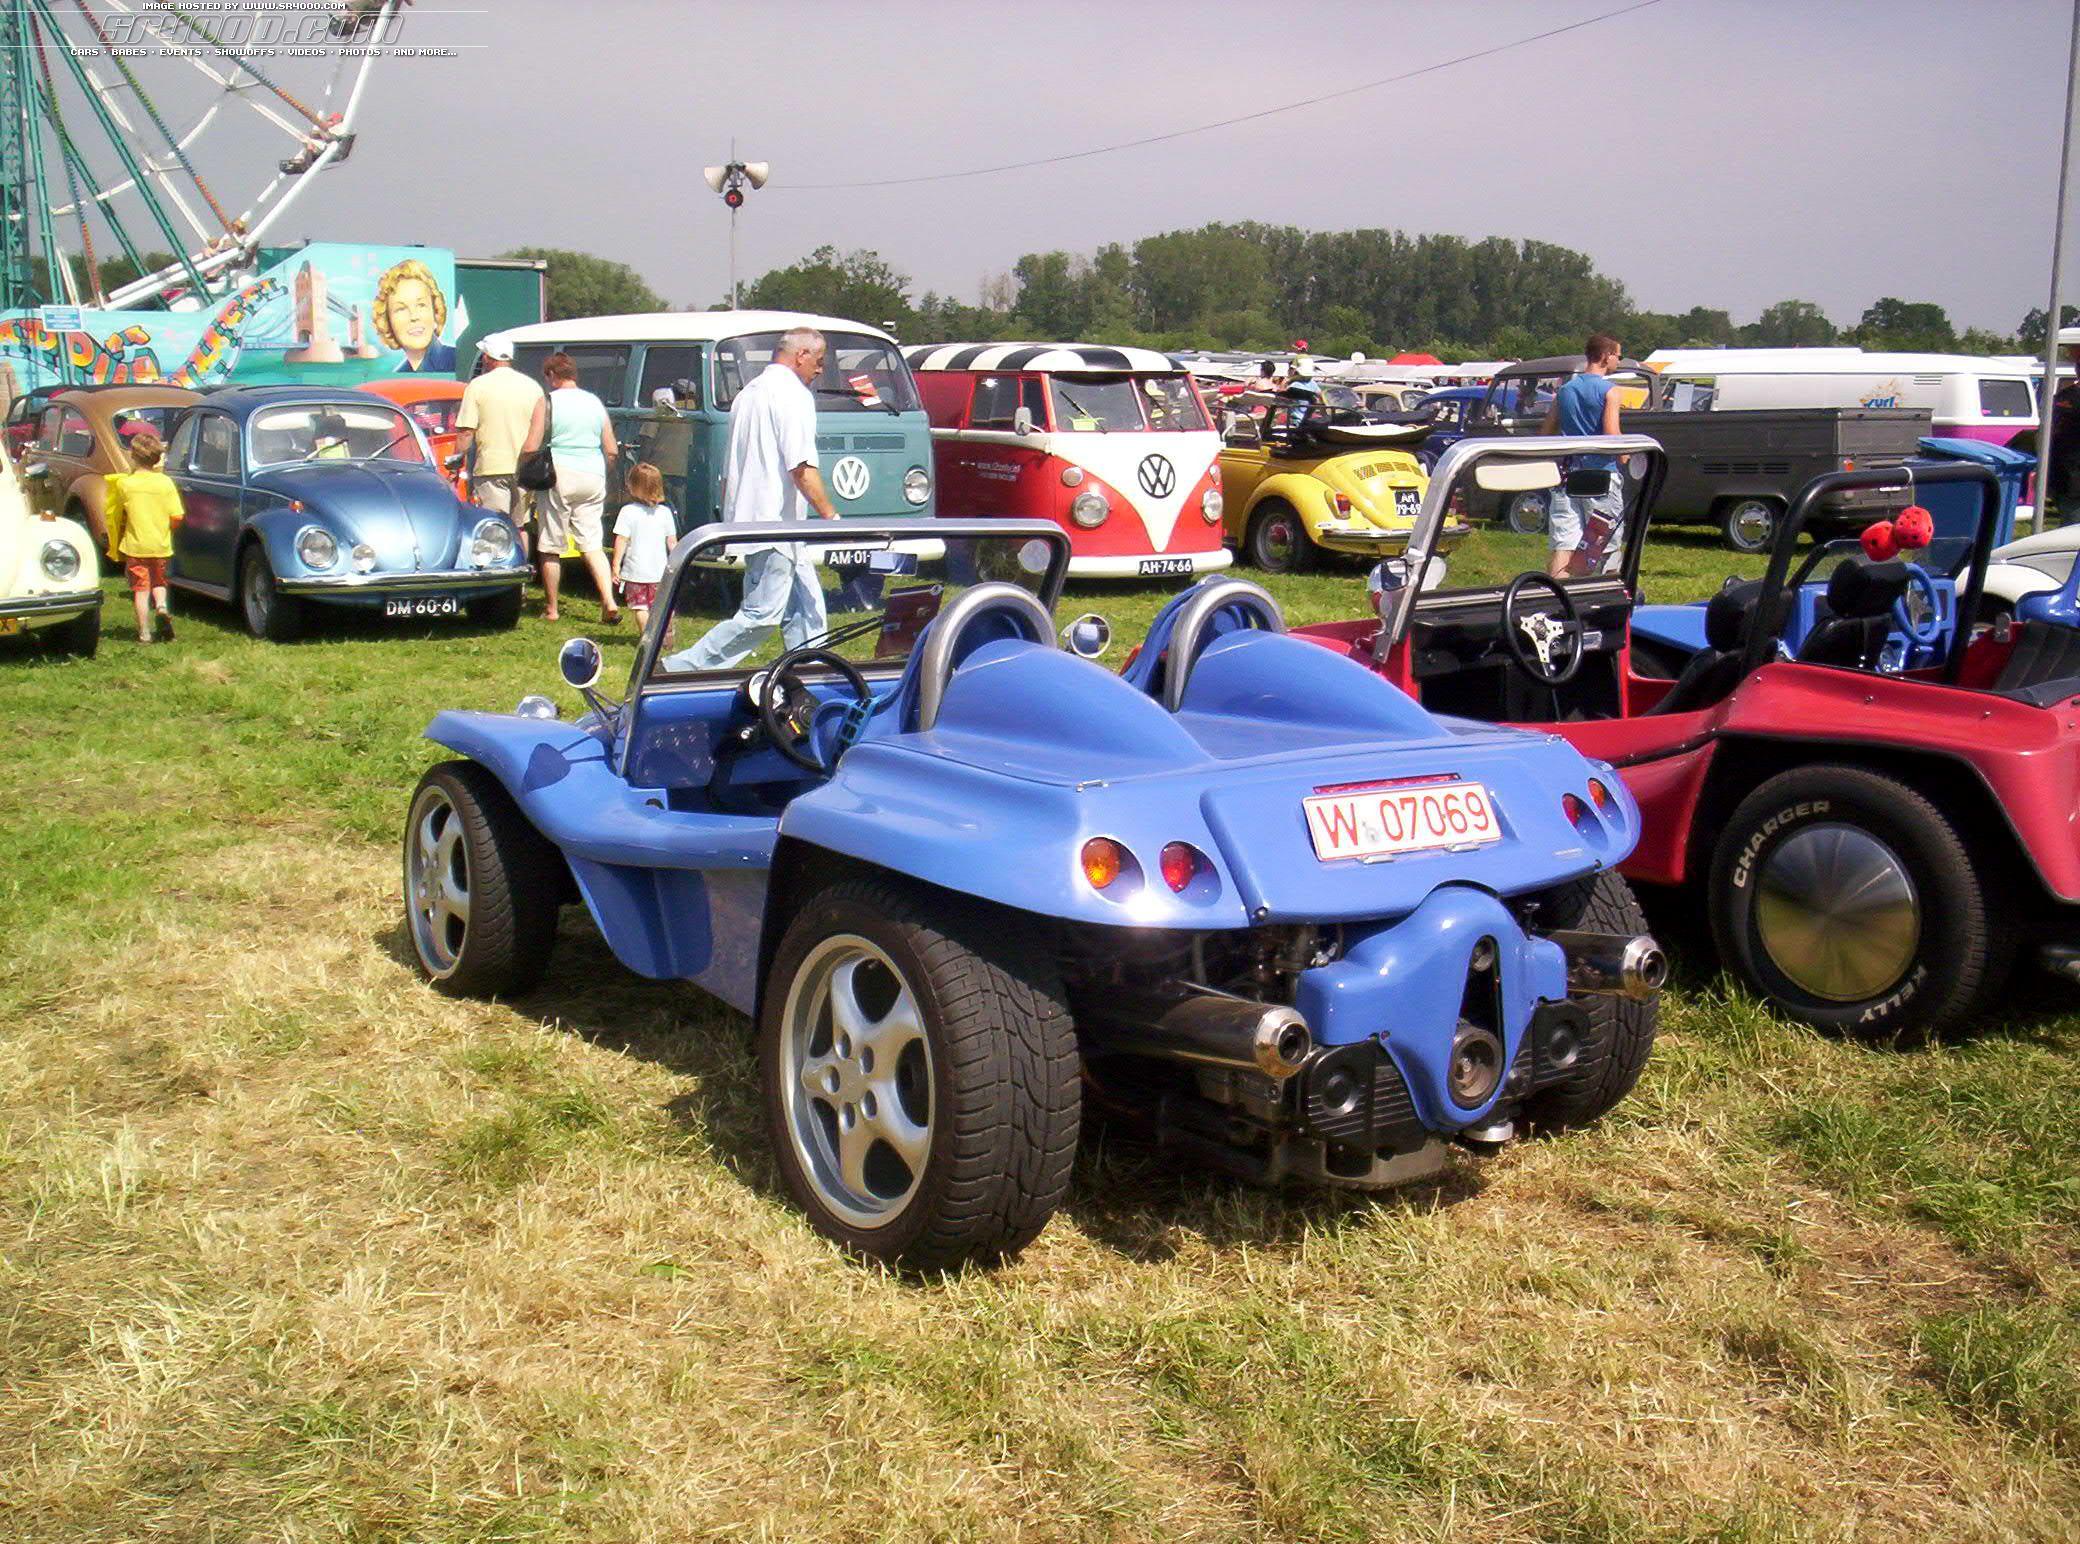 4x4 dune buggy car tuning